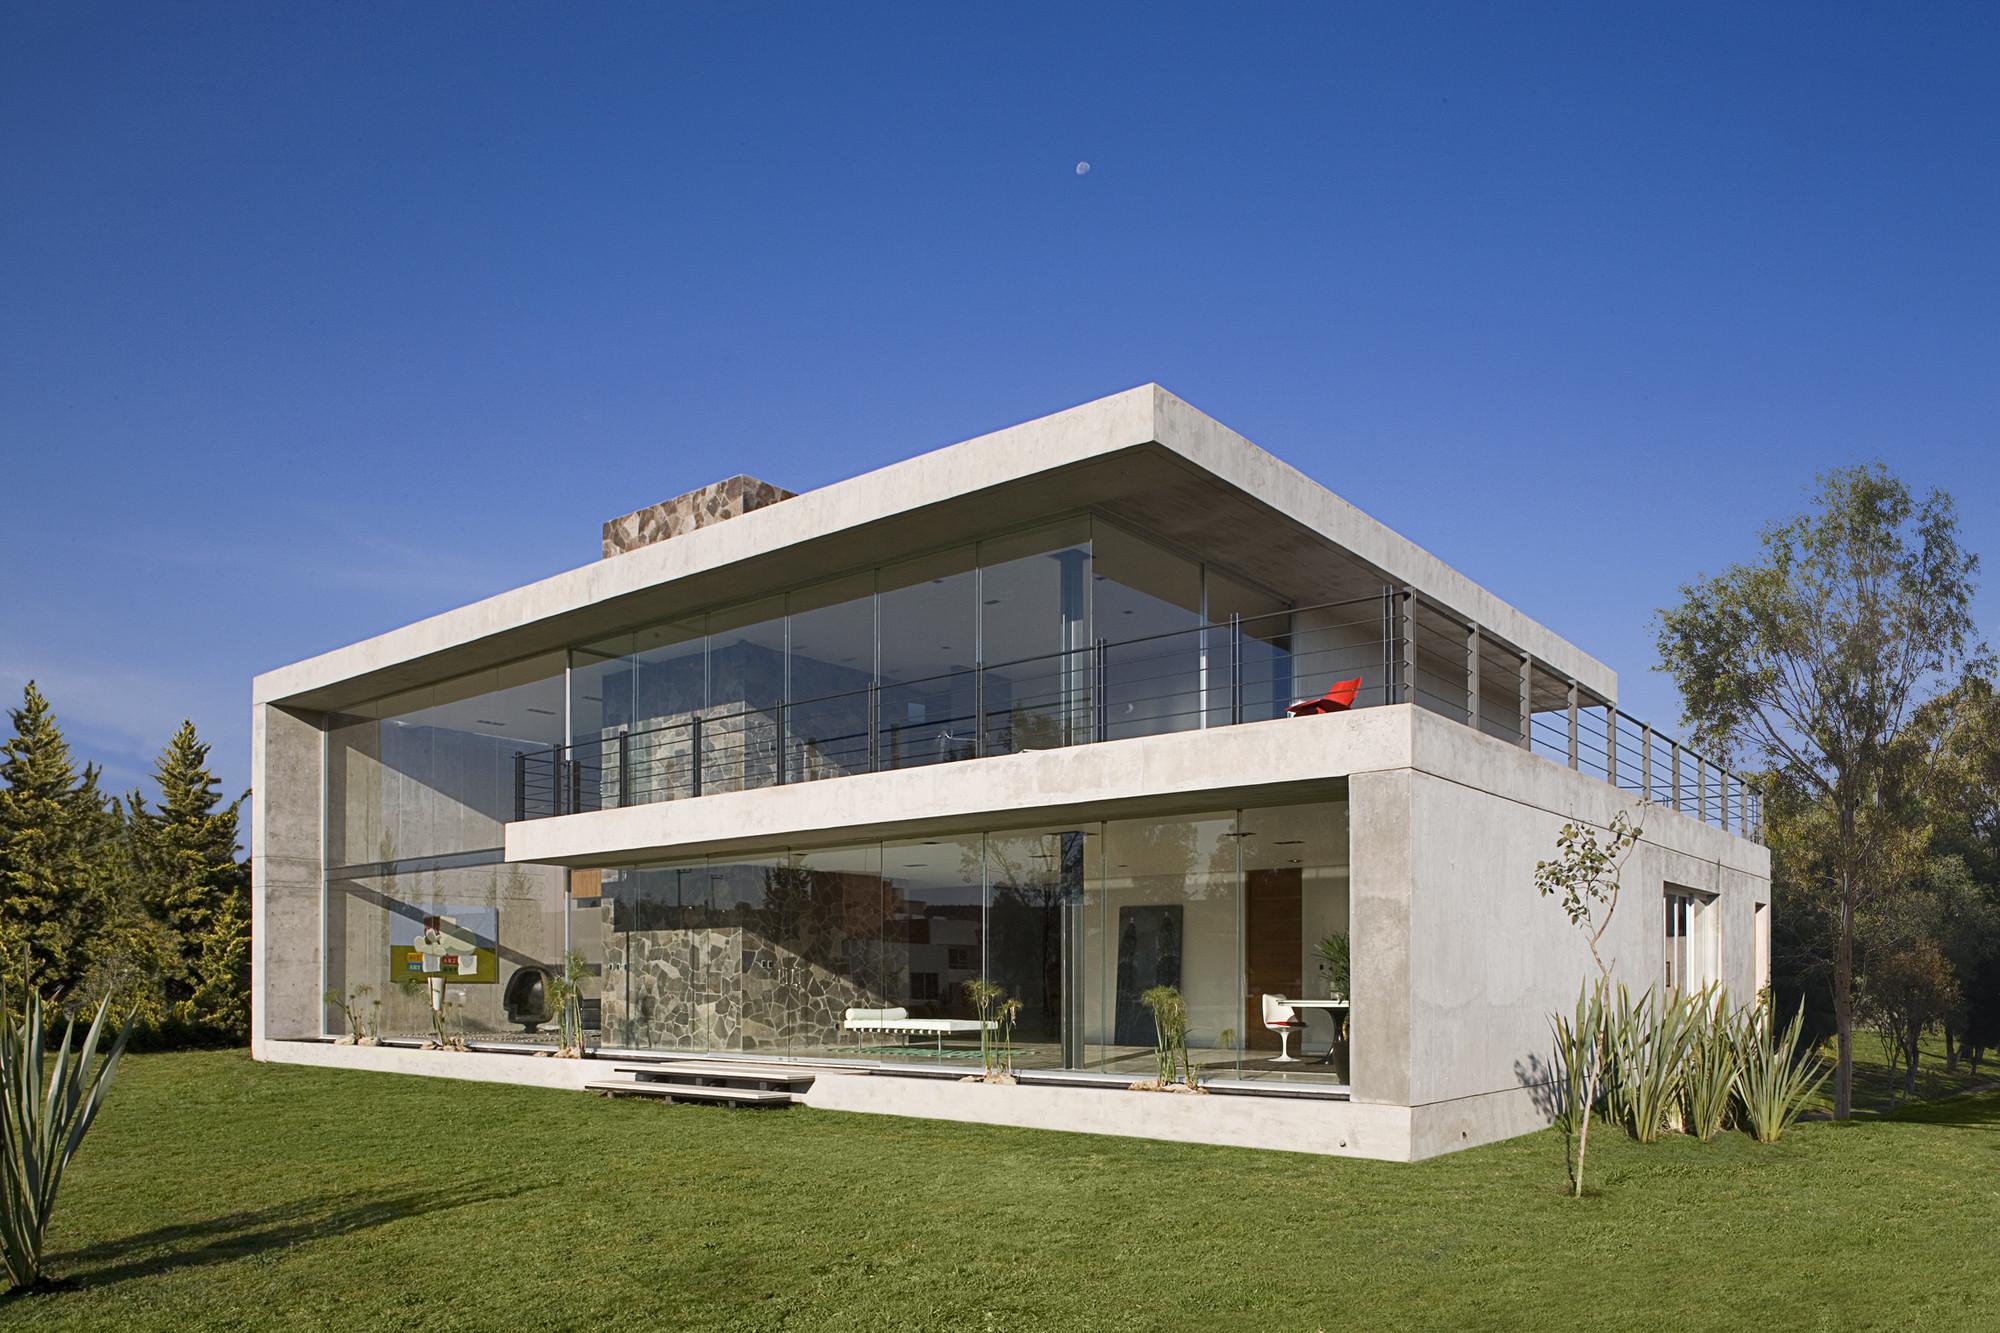 Gp house bitar arquitectos archdaily - Casas prefabricadas hormigon segunda mano ...